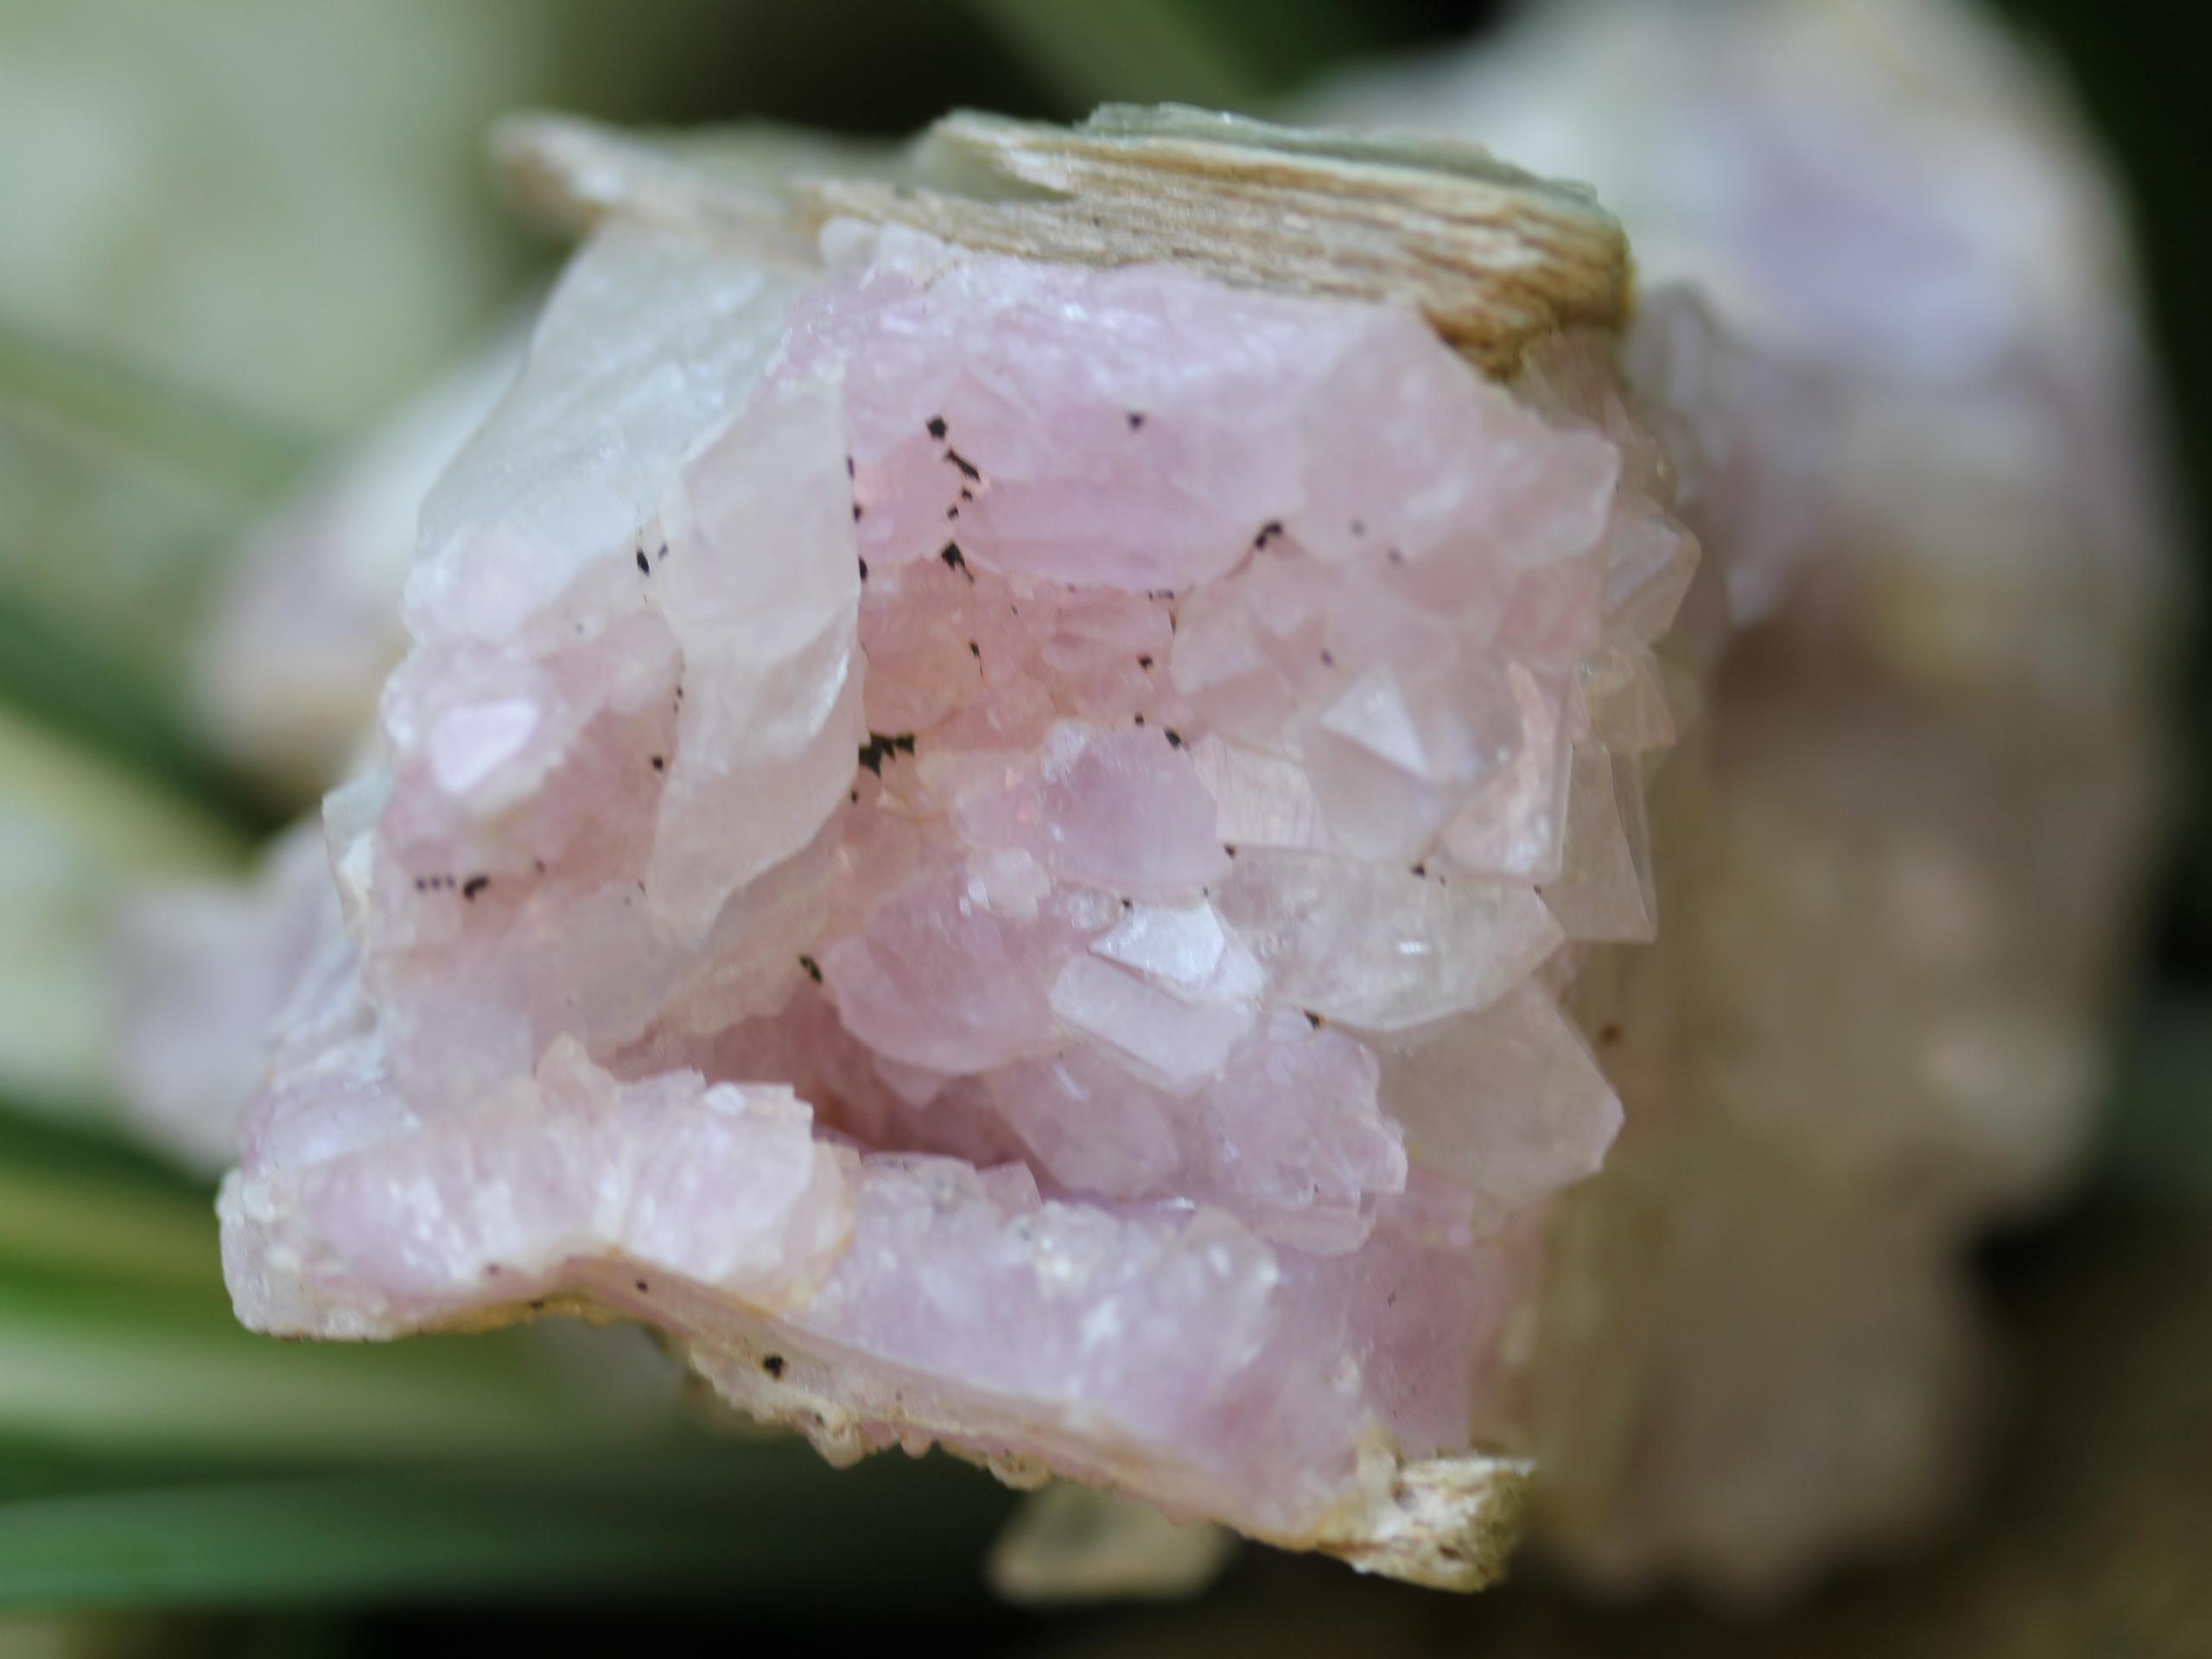 Light-colored rose quartz crystals